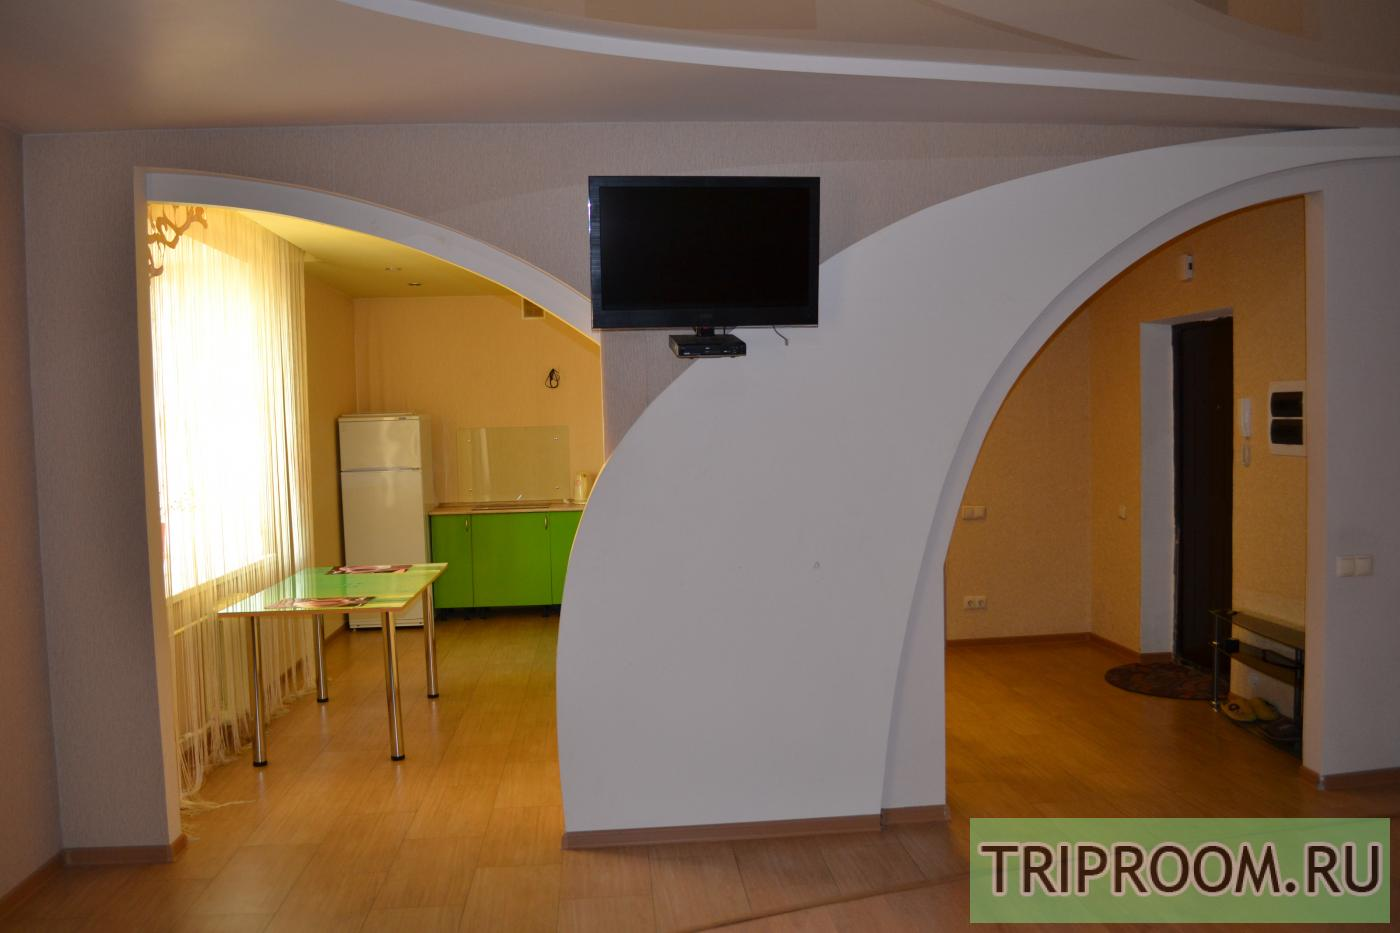 1-комнатная квартира посуточно (вариант № 591), ул. Революции проспект, фото № 6